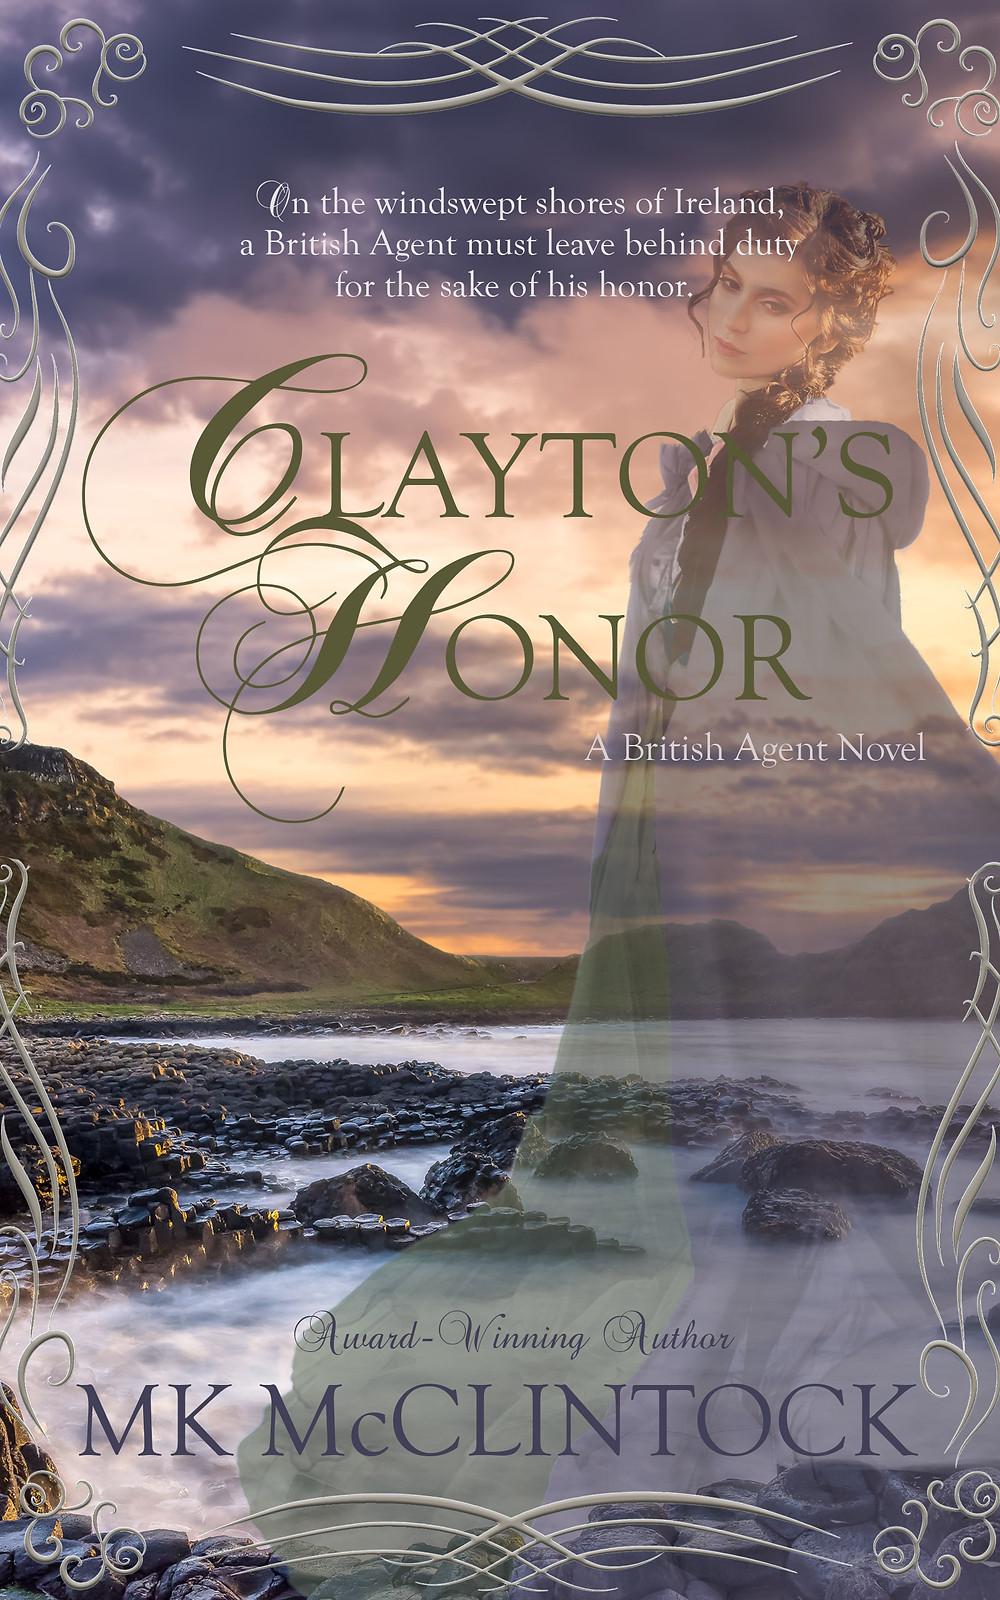 Clayton's Honor by MK McClintock - historical romance mystery novel